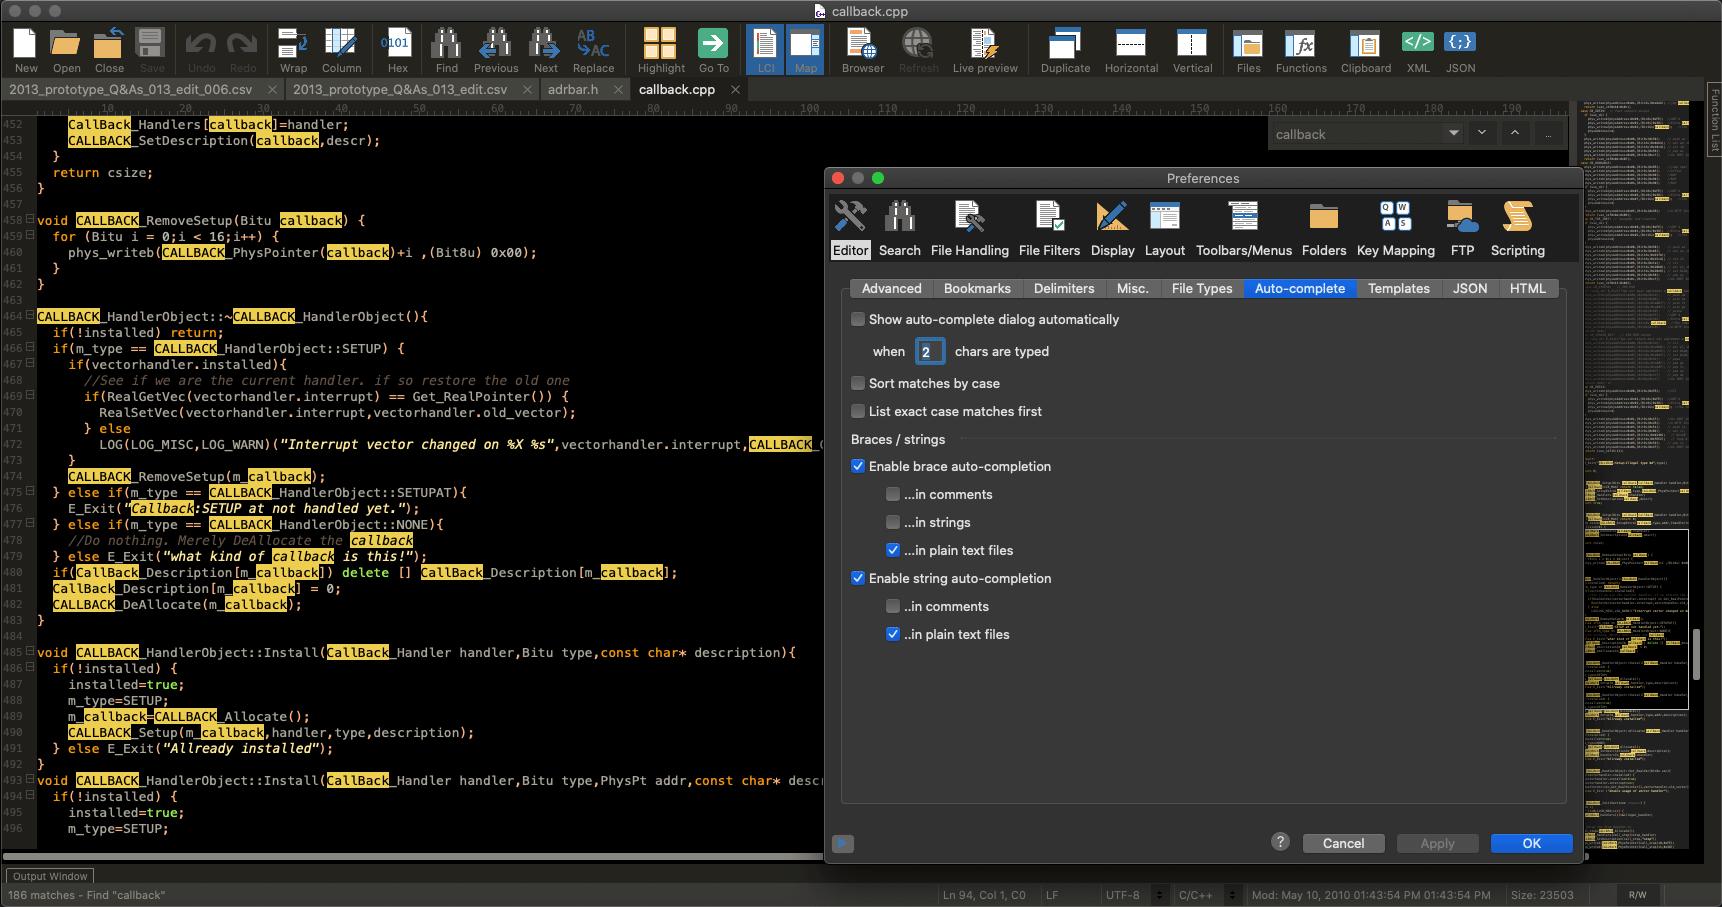 UltraEdit 28.0.0.98 Crack Serial Key